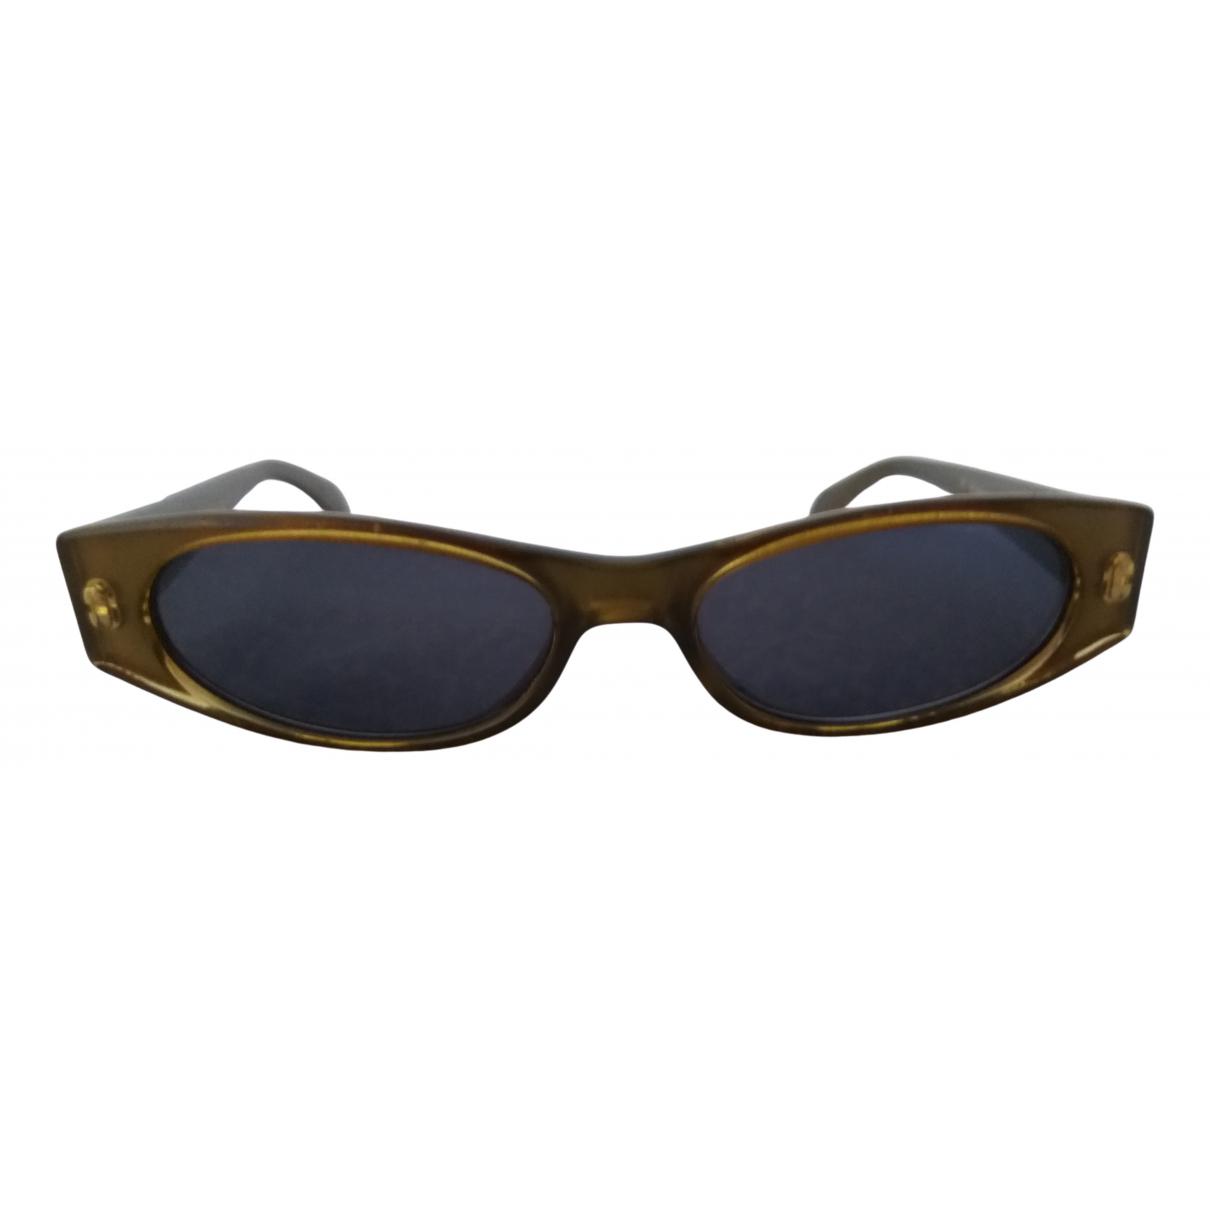 Gucci N Gold Sunglasses for Women N